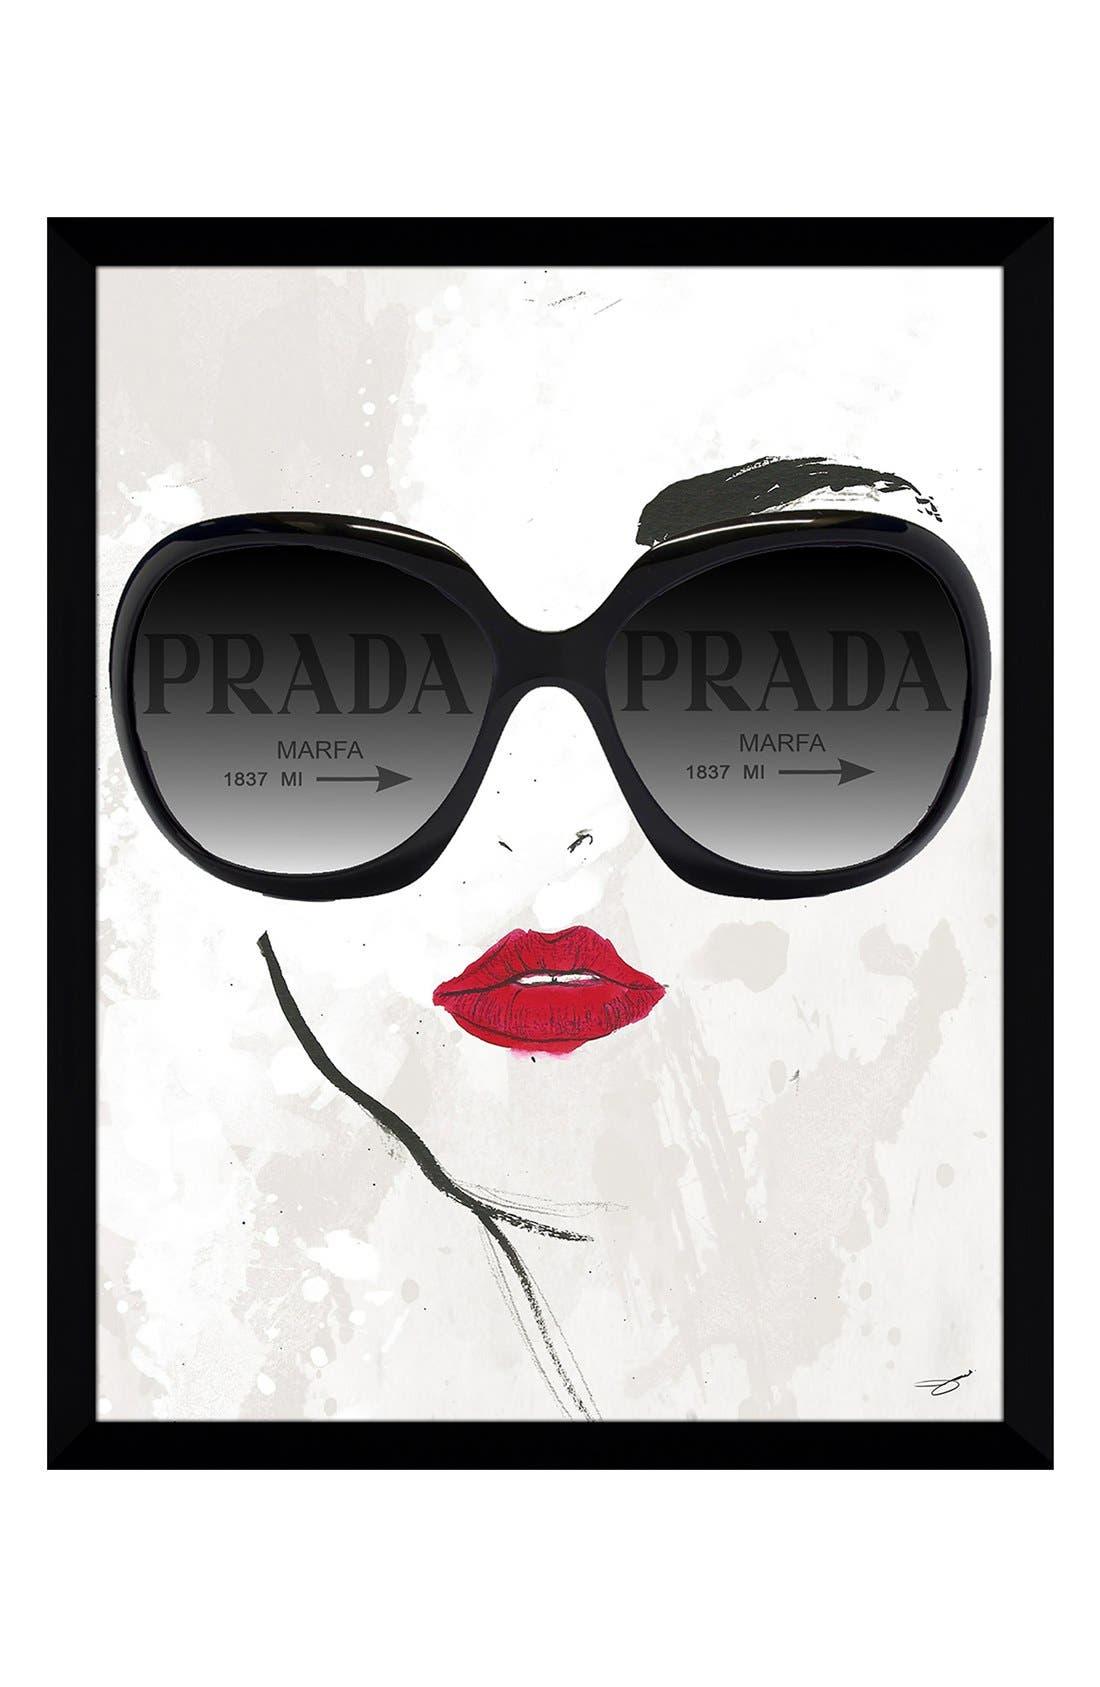 Alternate Image 1 Selected - Picture Perfect 'Prada Sunnies' Fine Art Print